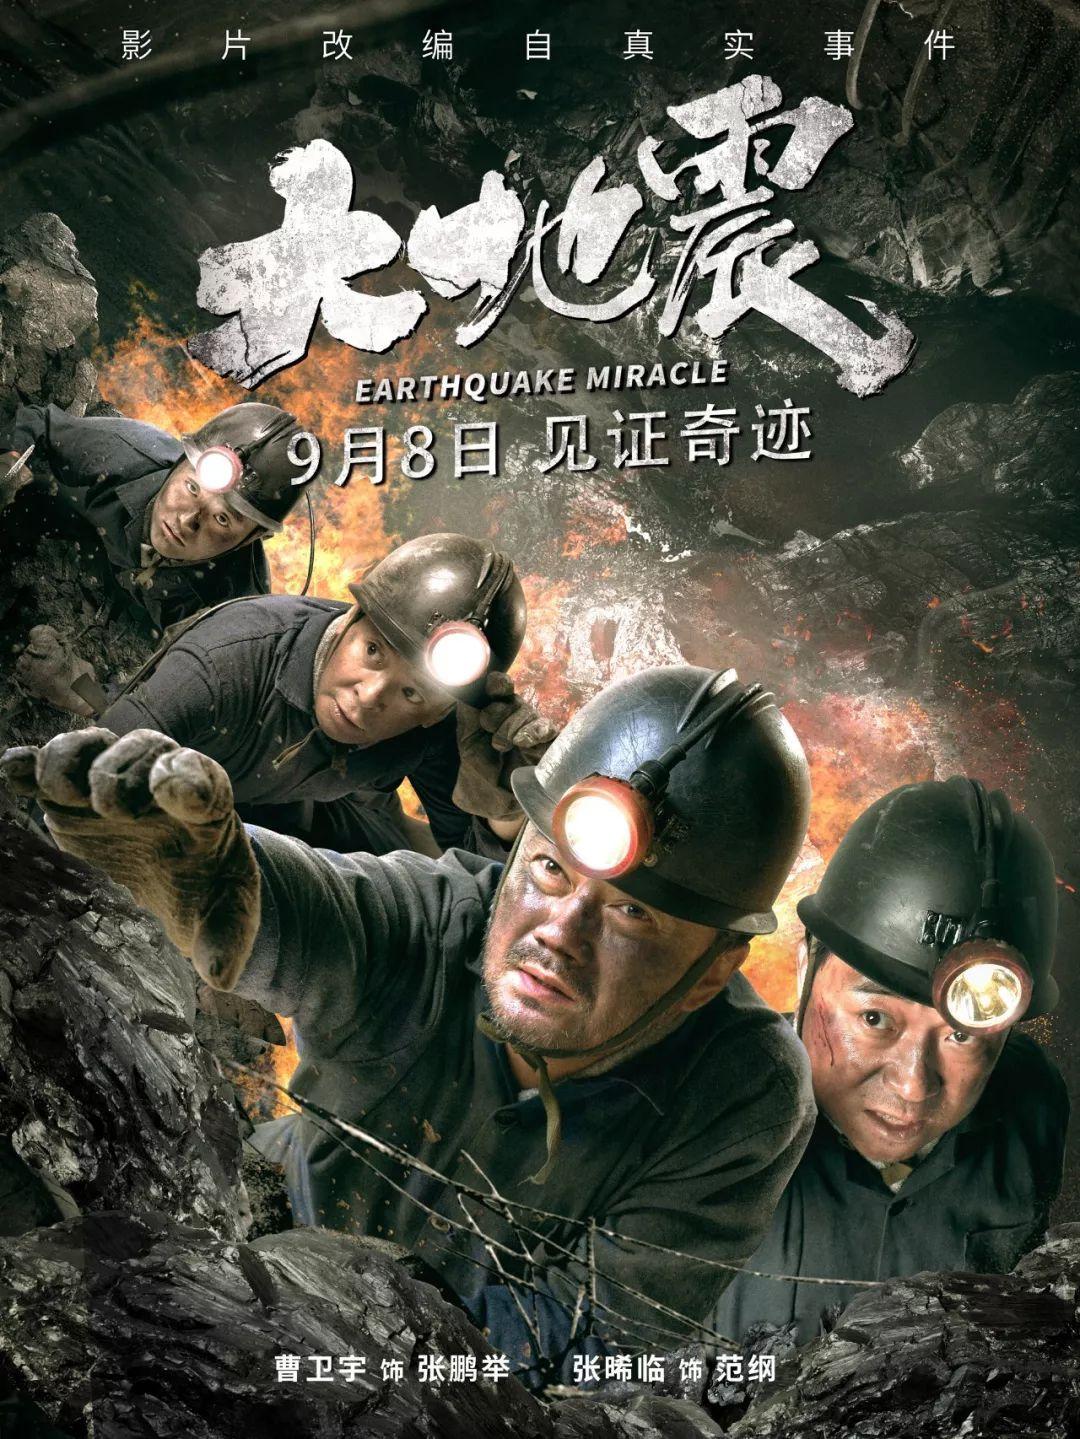 http://www.k2summit.cn/shumashebei/1084072.html